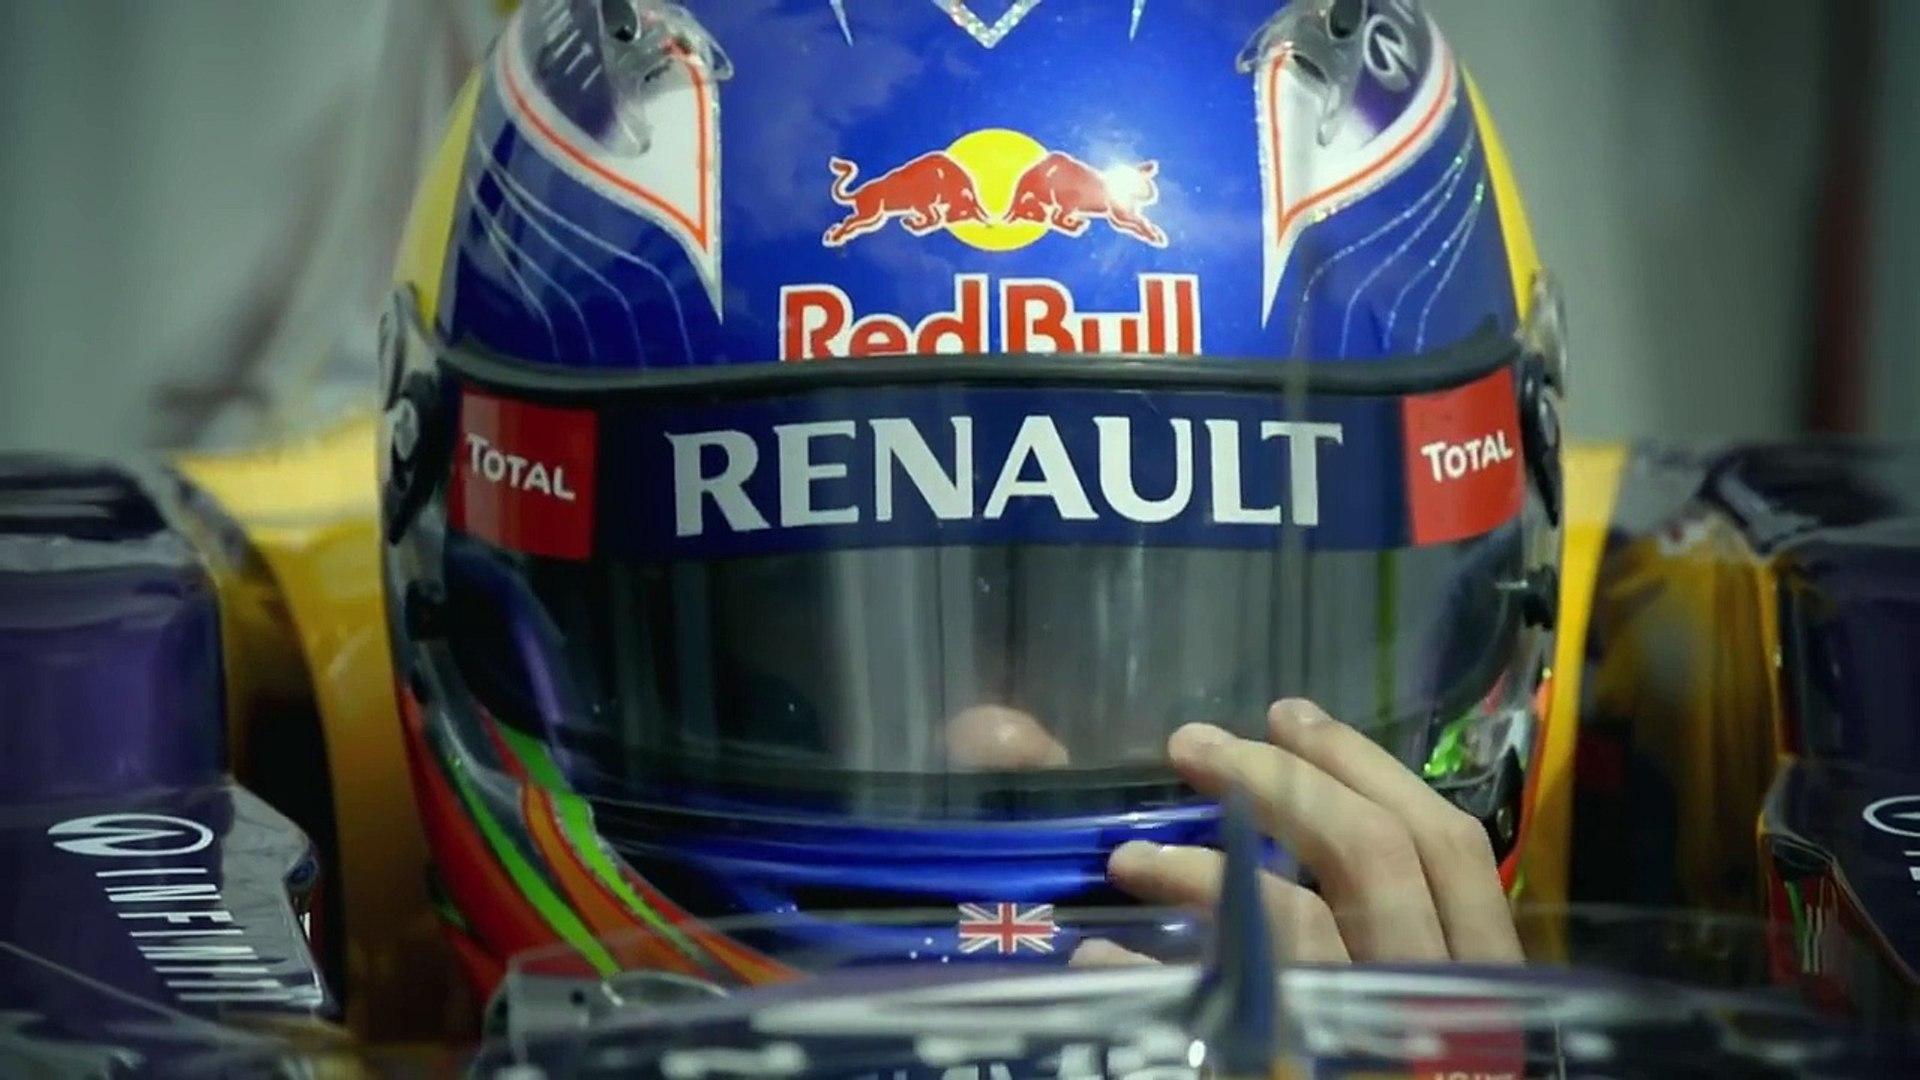 F1 car vs F-18 Hornet fighter jet - Daniel Ricciardo F1 car races fighter jet - AMAZING